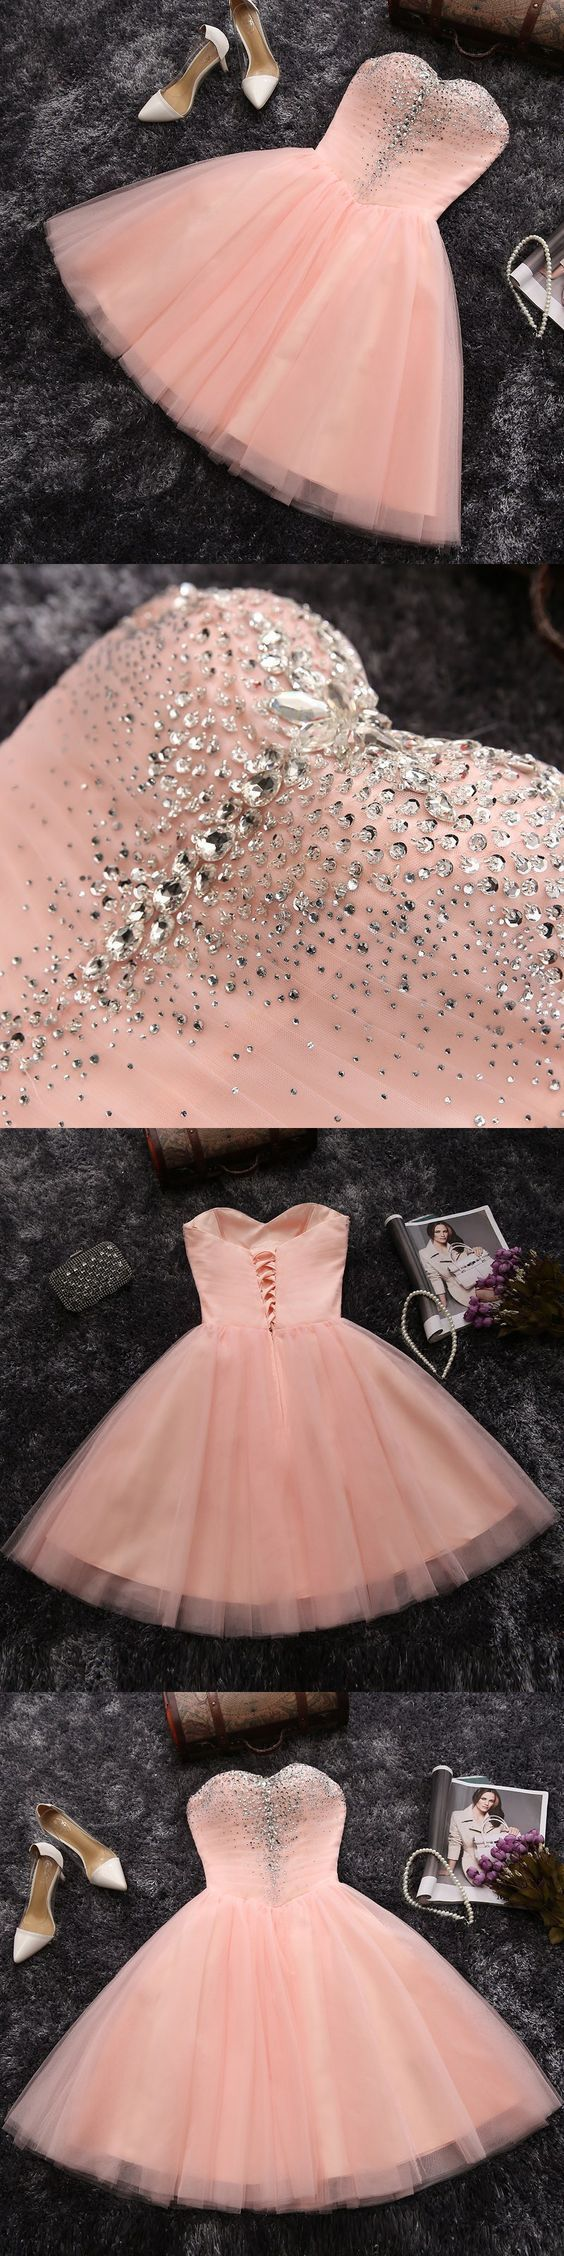 Charming Prom Dress,Tulle Pink Prom Dress,Short Prom Dresses